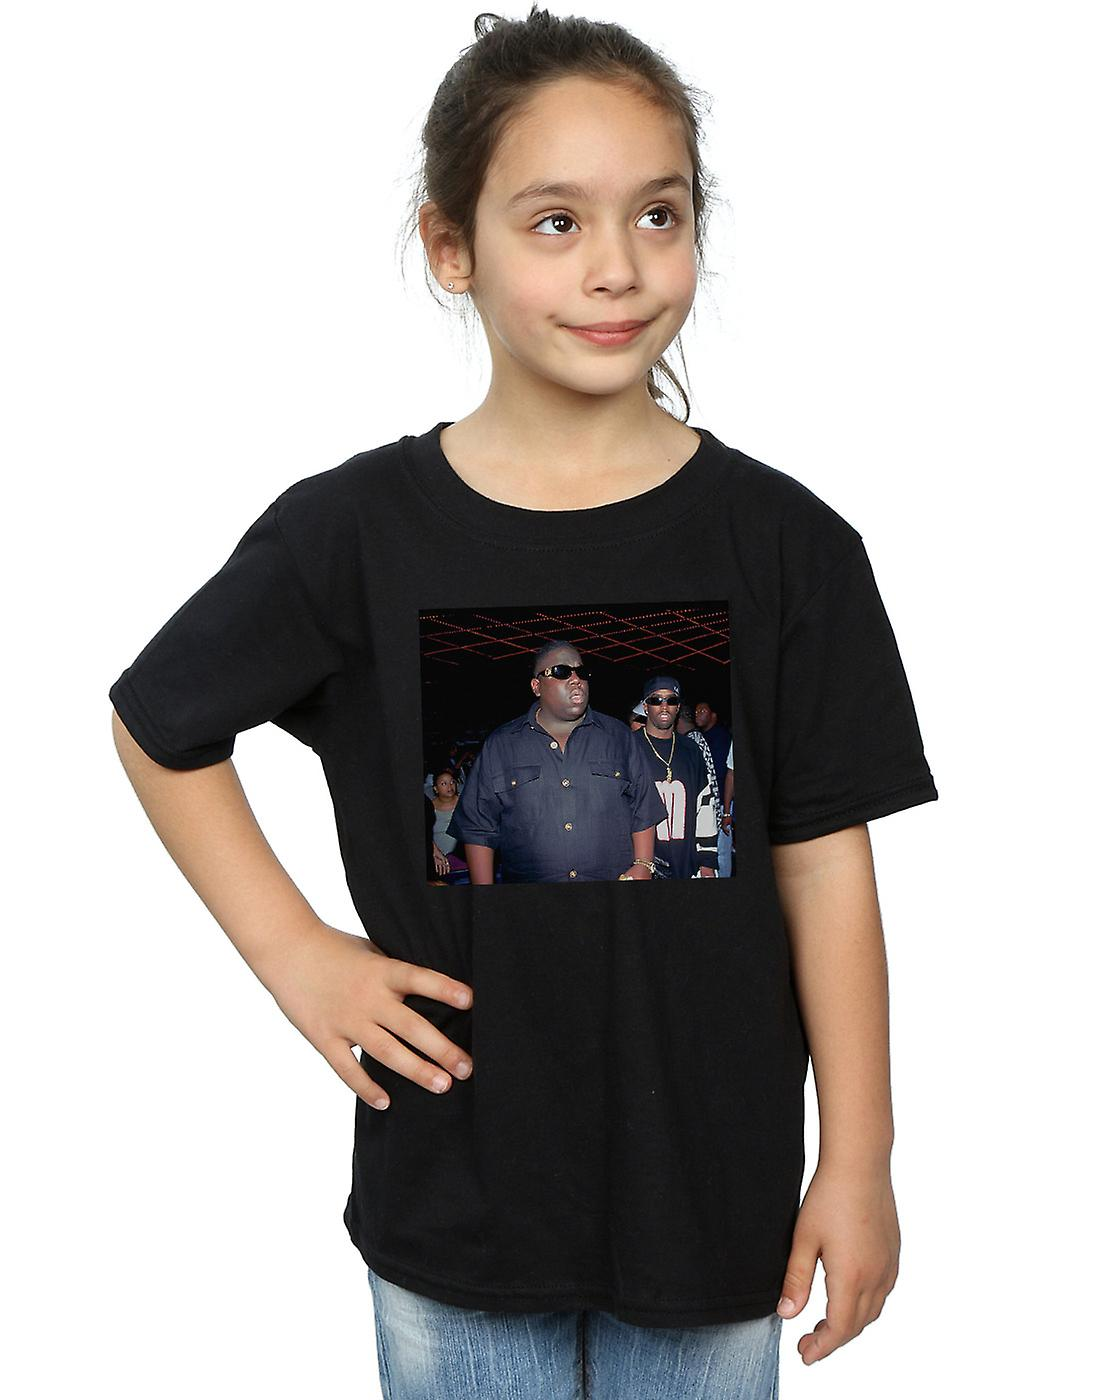 Notorious BIG Girls Big And Puff Photo T-Shirt